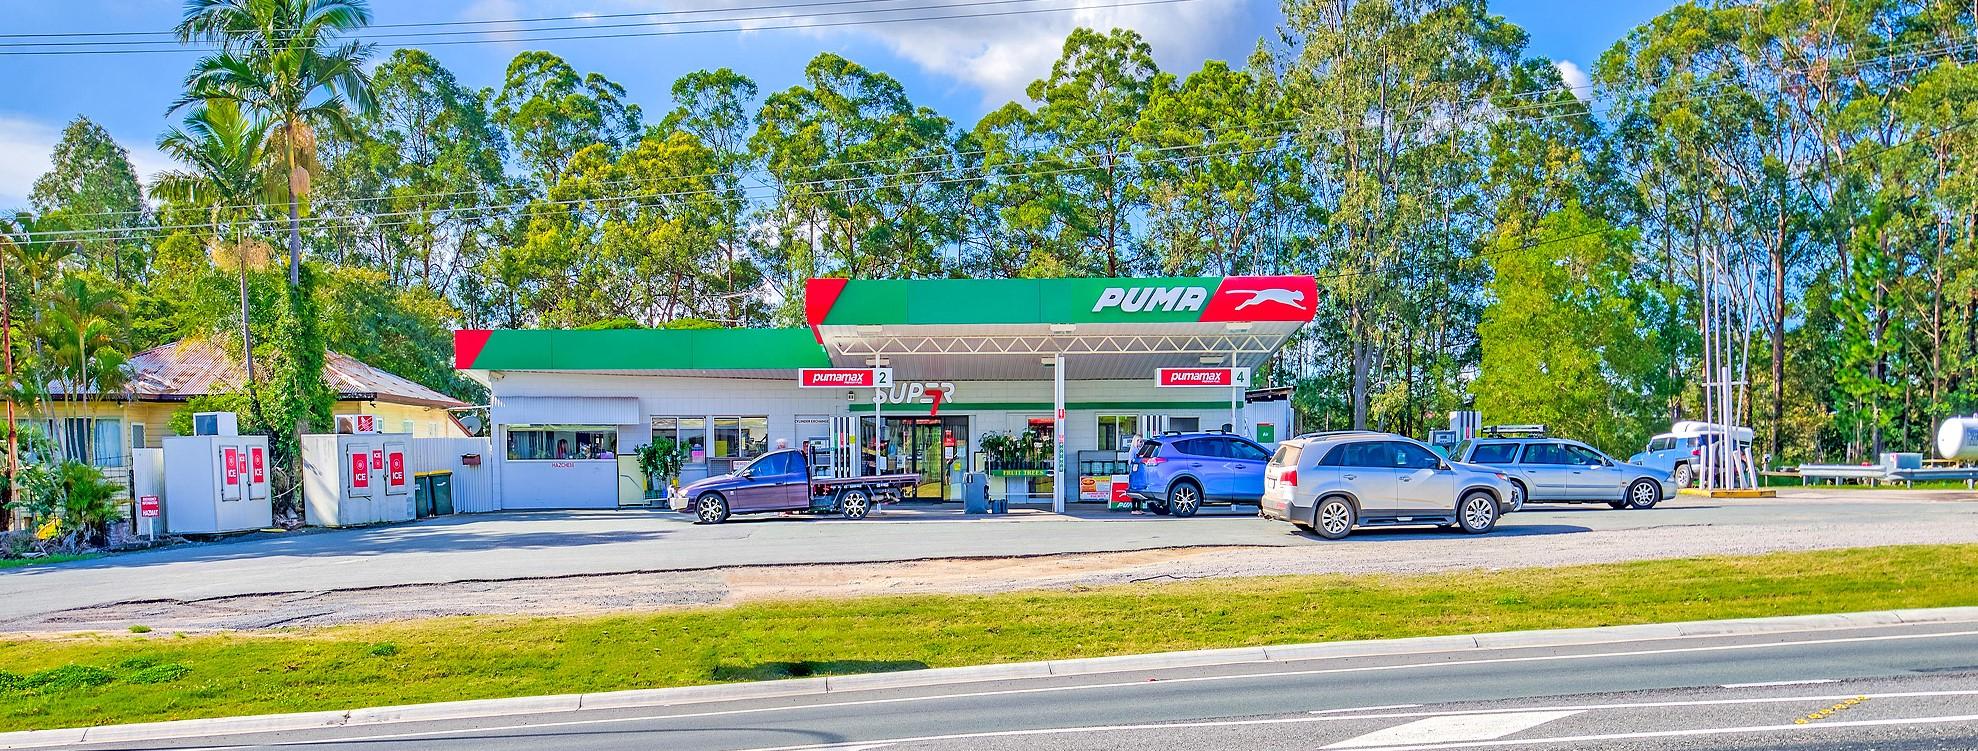 Puma Fuel Station, D'Aguilar